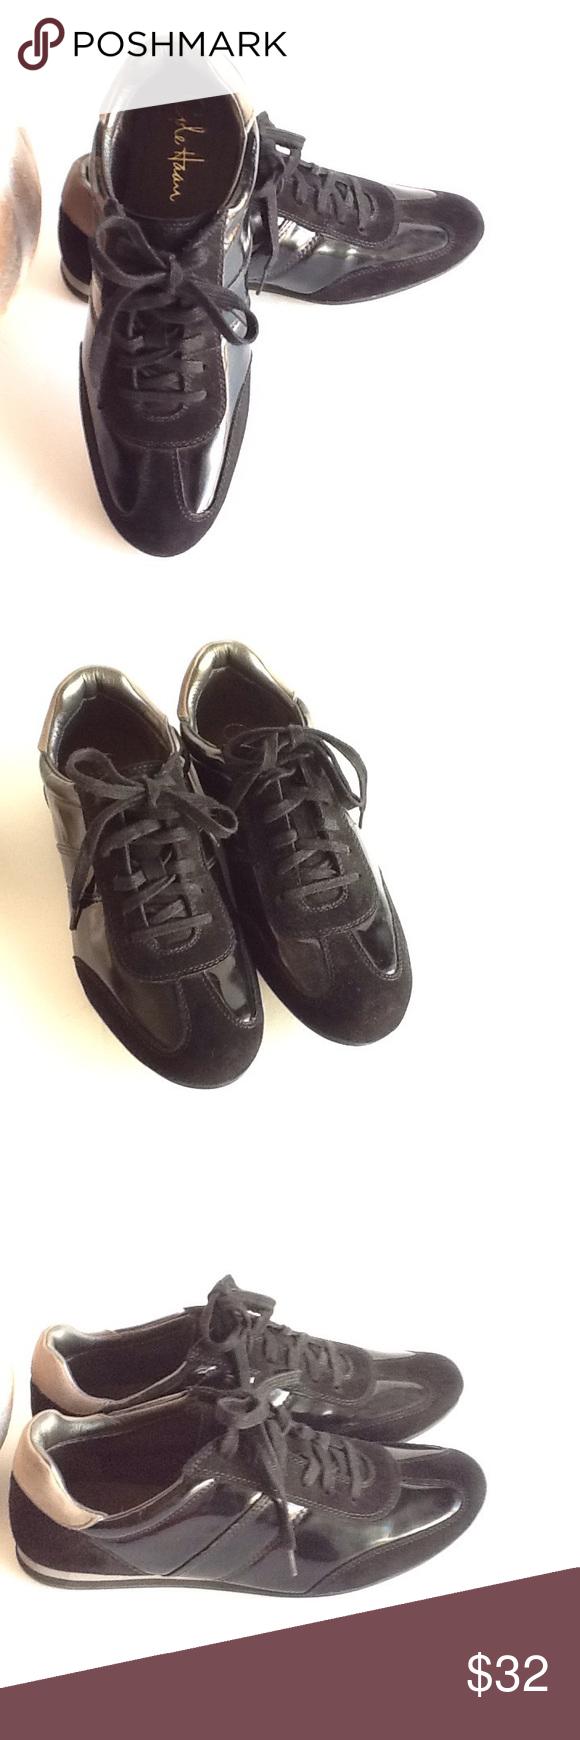 Cole Haan Nike Air Tennis Shoes NWOT